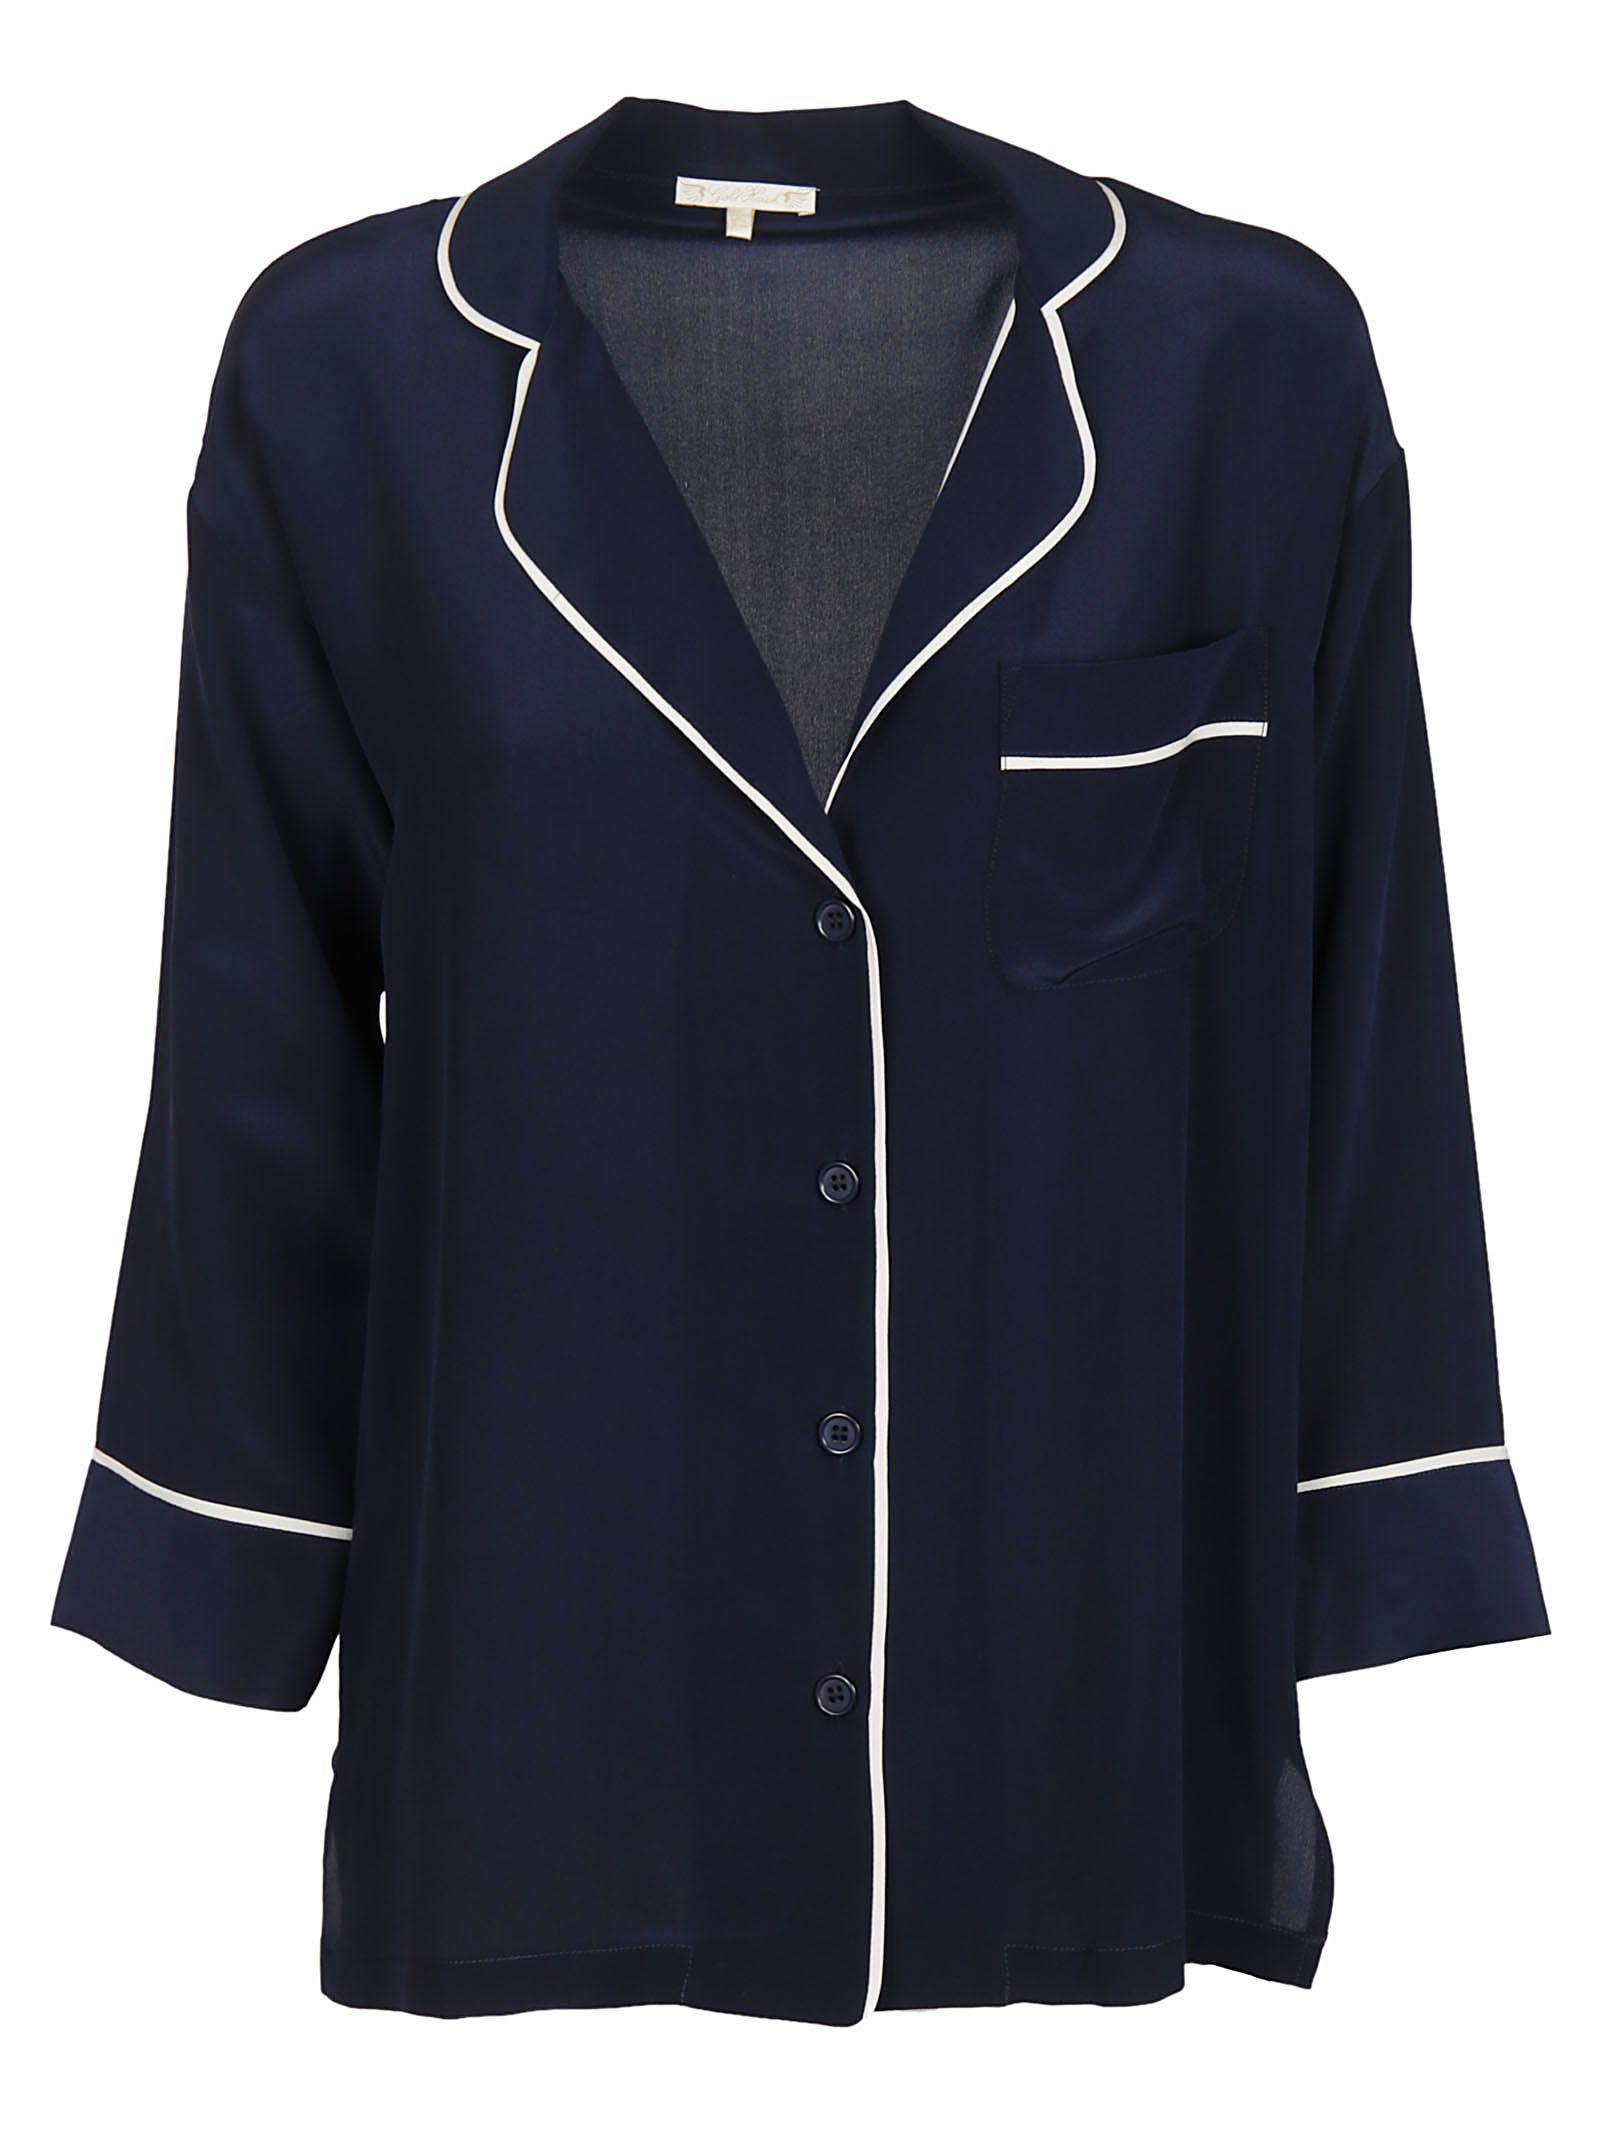 Gold Hawk Pajama Shirt